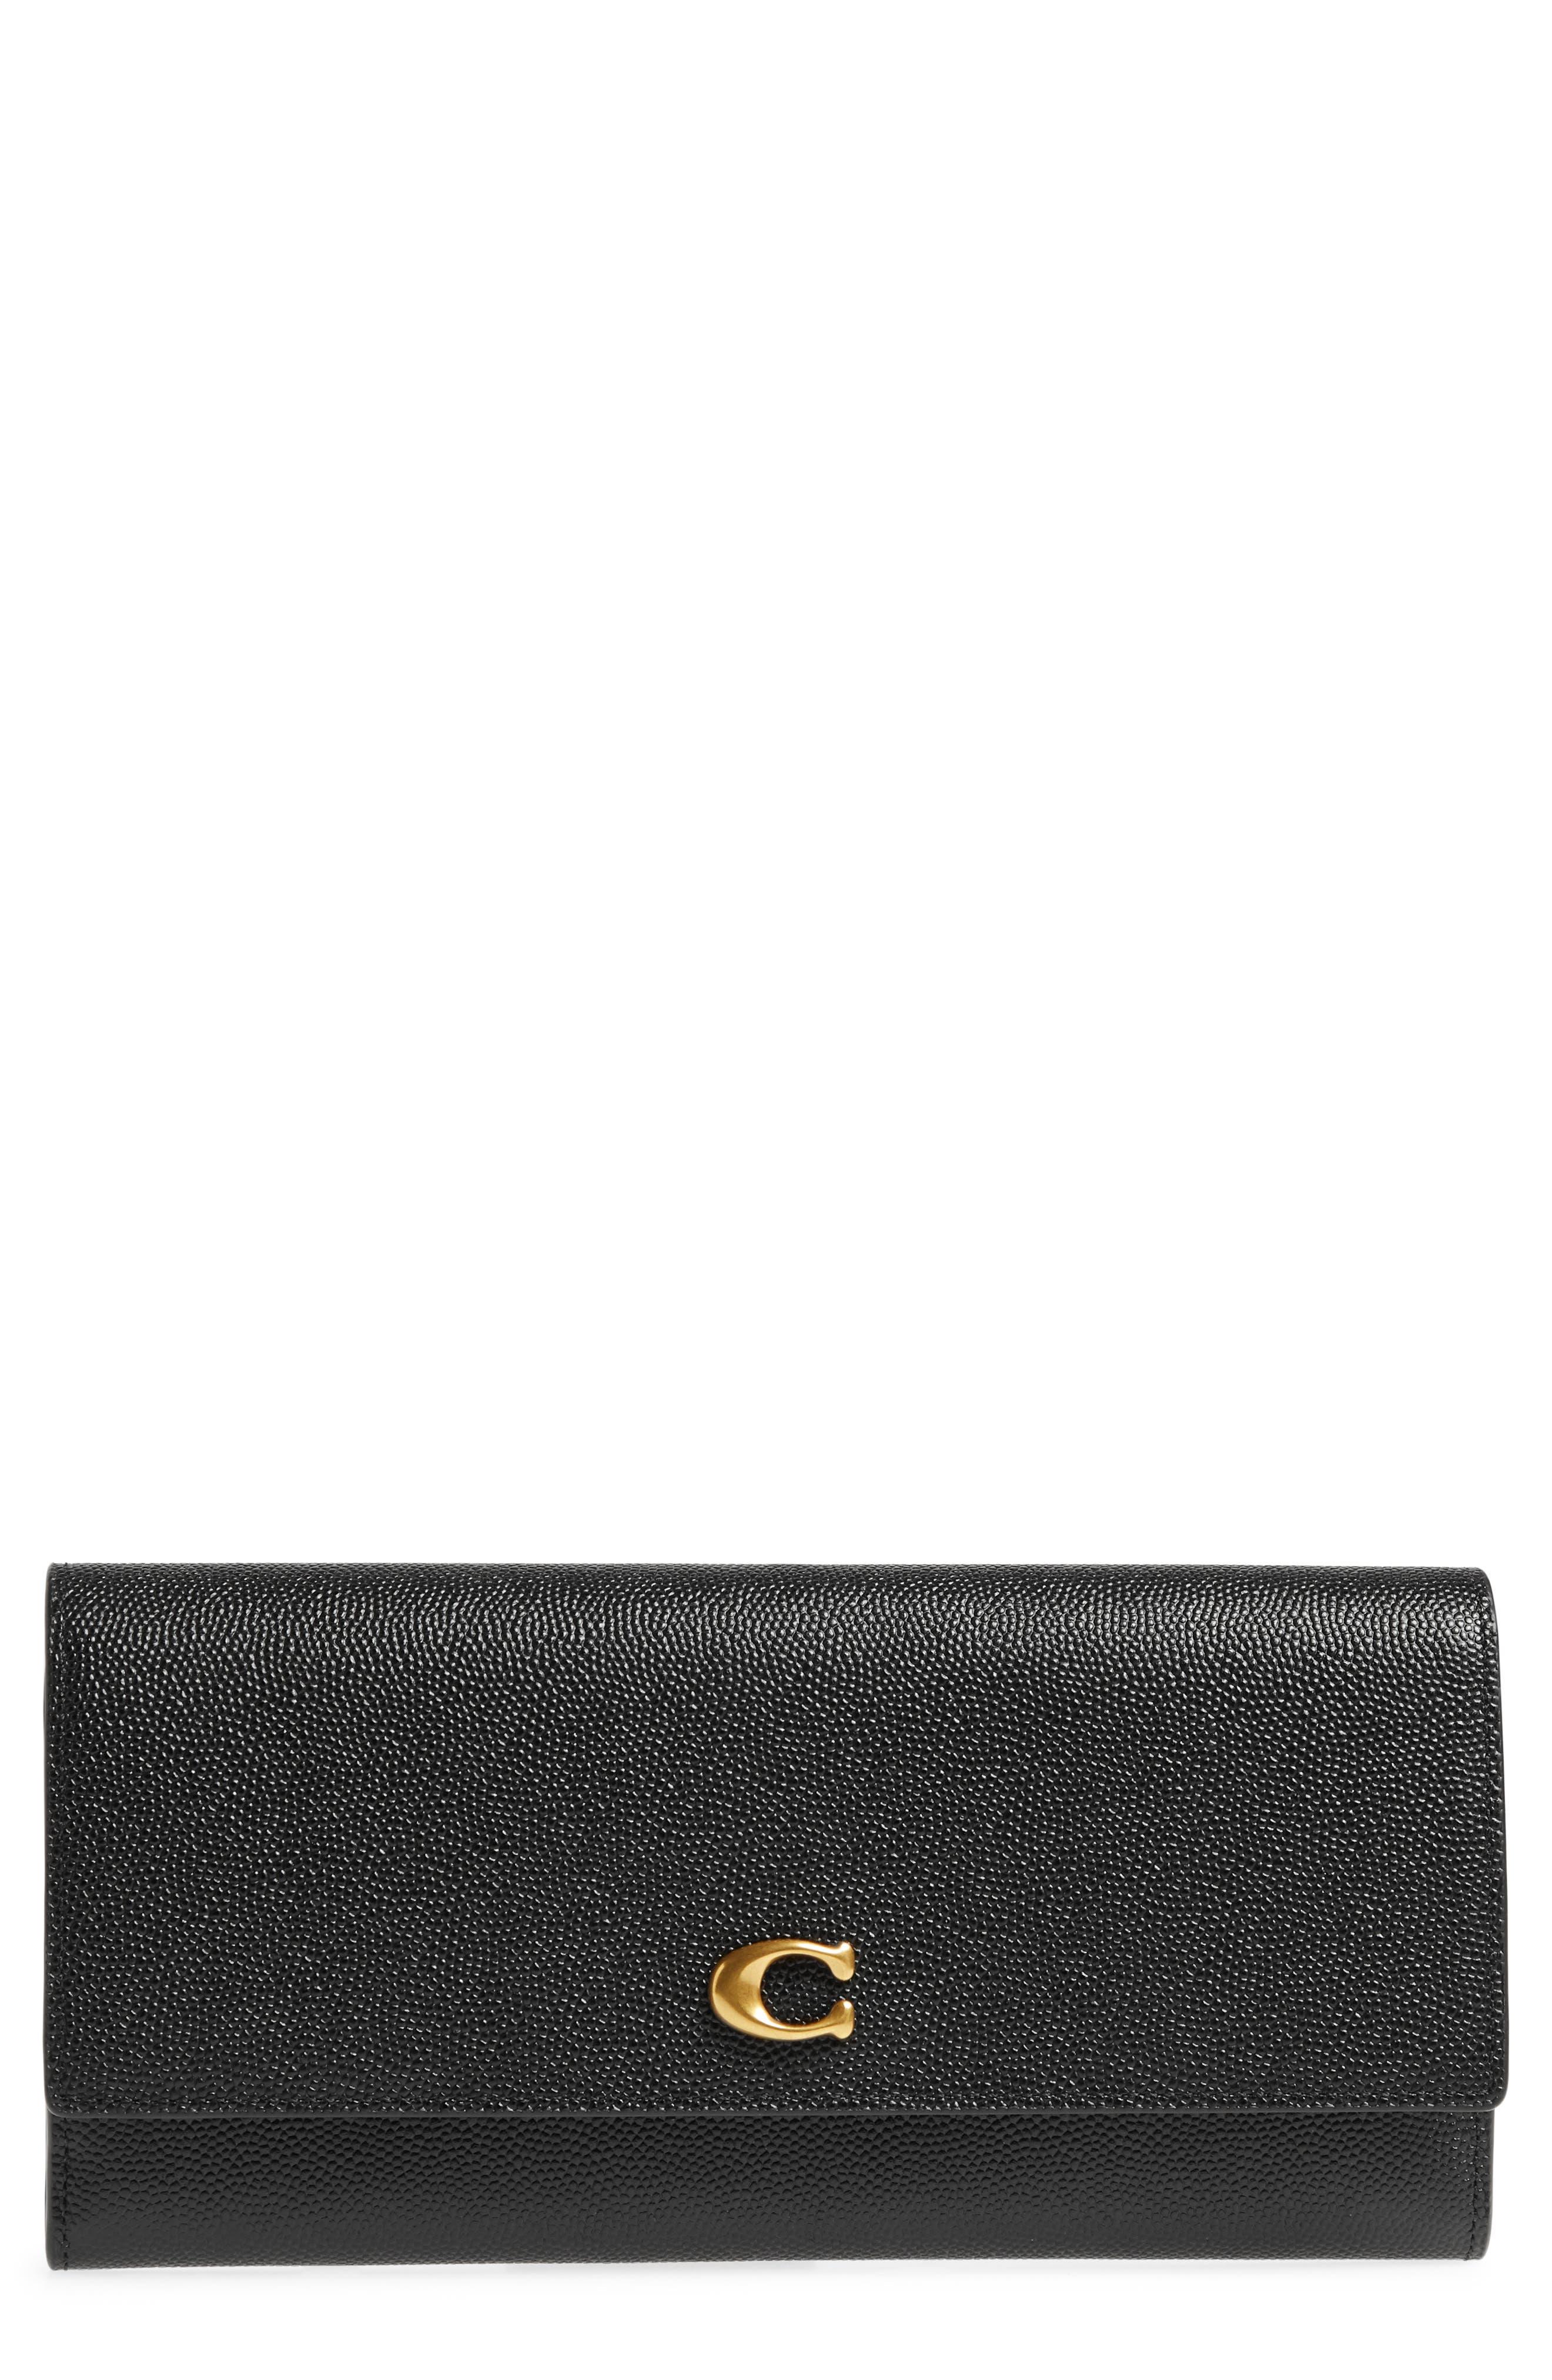 1959c7a210d Women s Wallets Sale